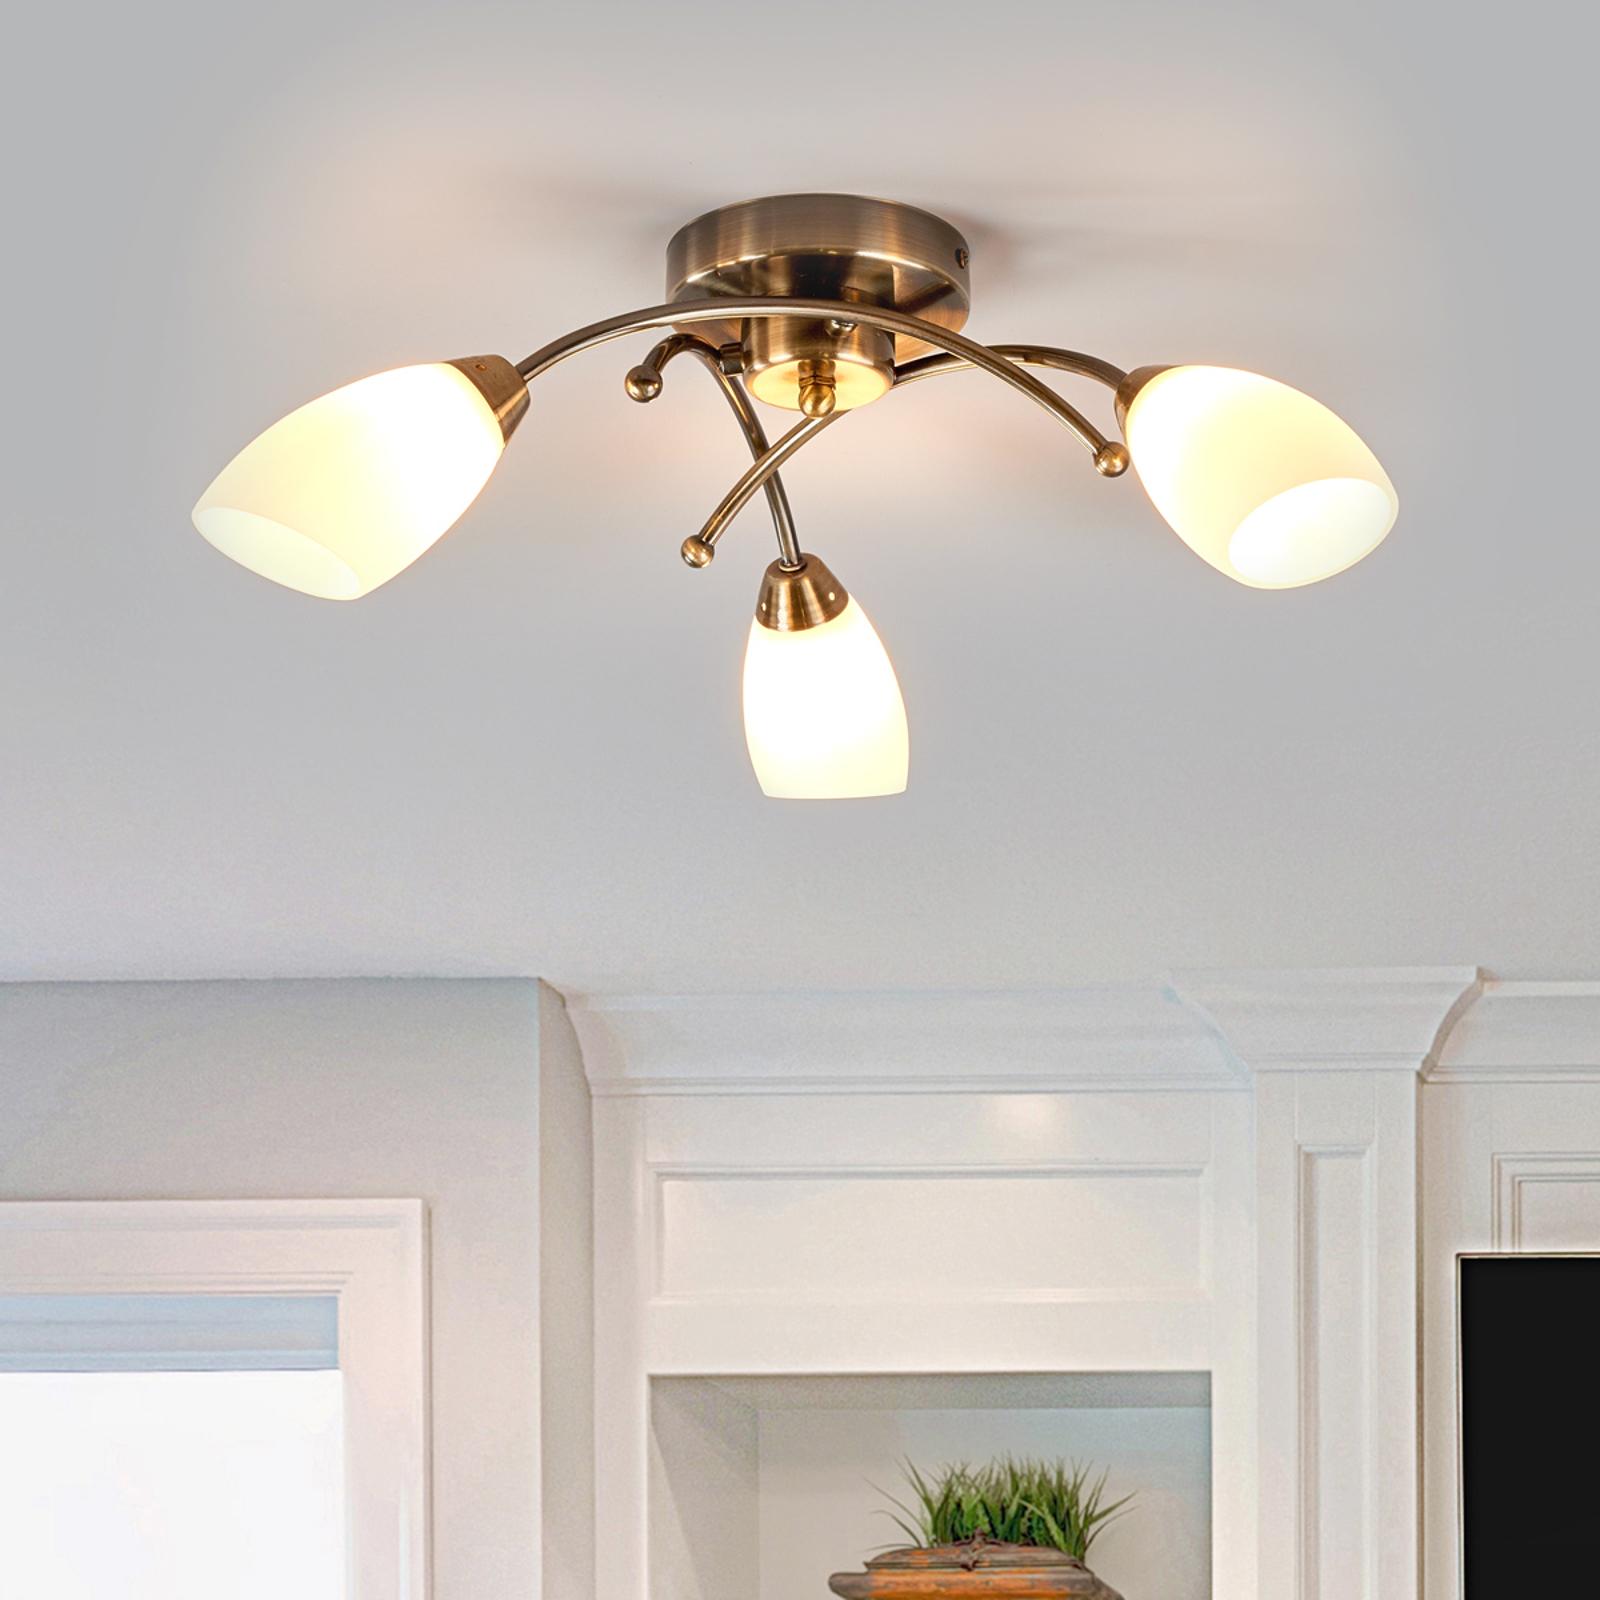 Wspaniała lampa sufitowa OPERA 3-punktowa mosiądz